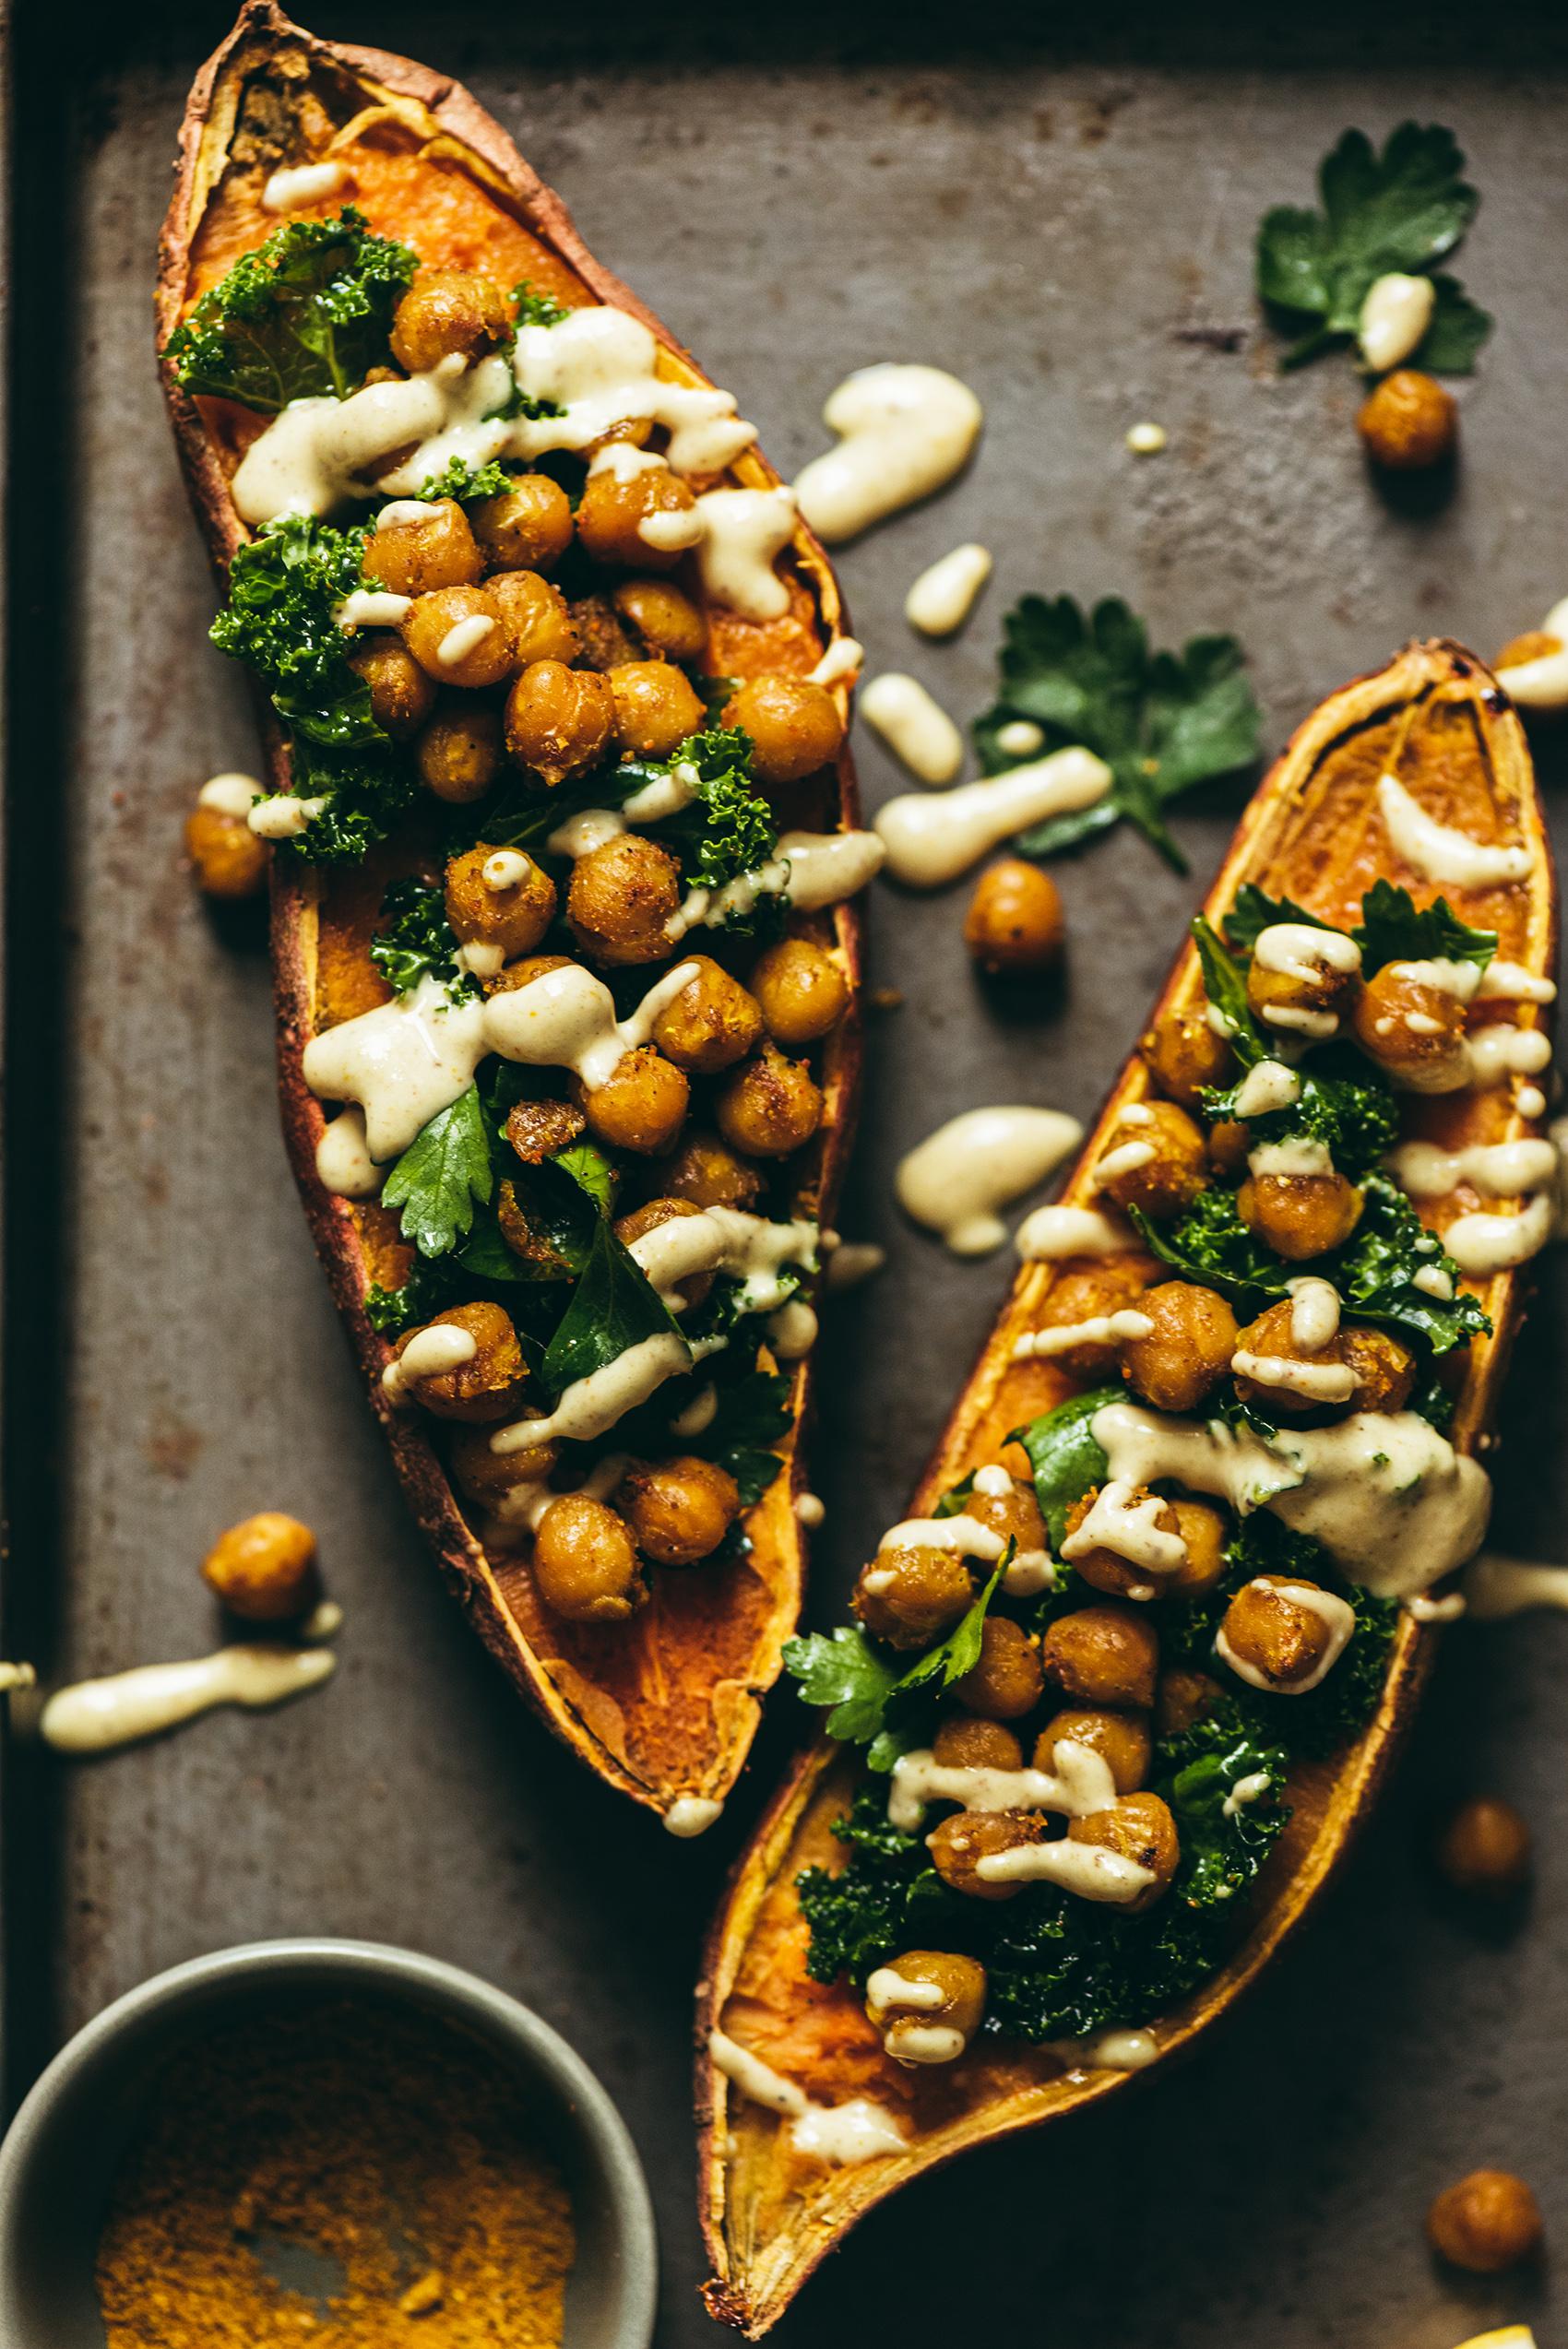 Patates douces au four pois chiches rotis chou kale - Lilie Bakery